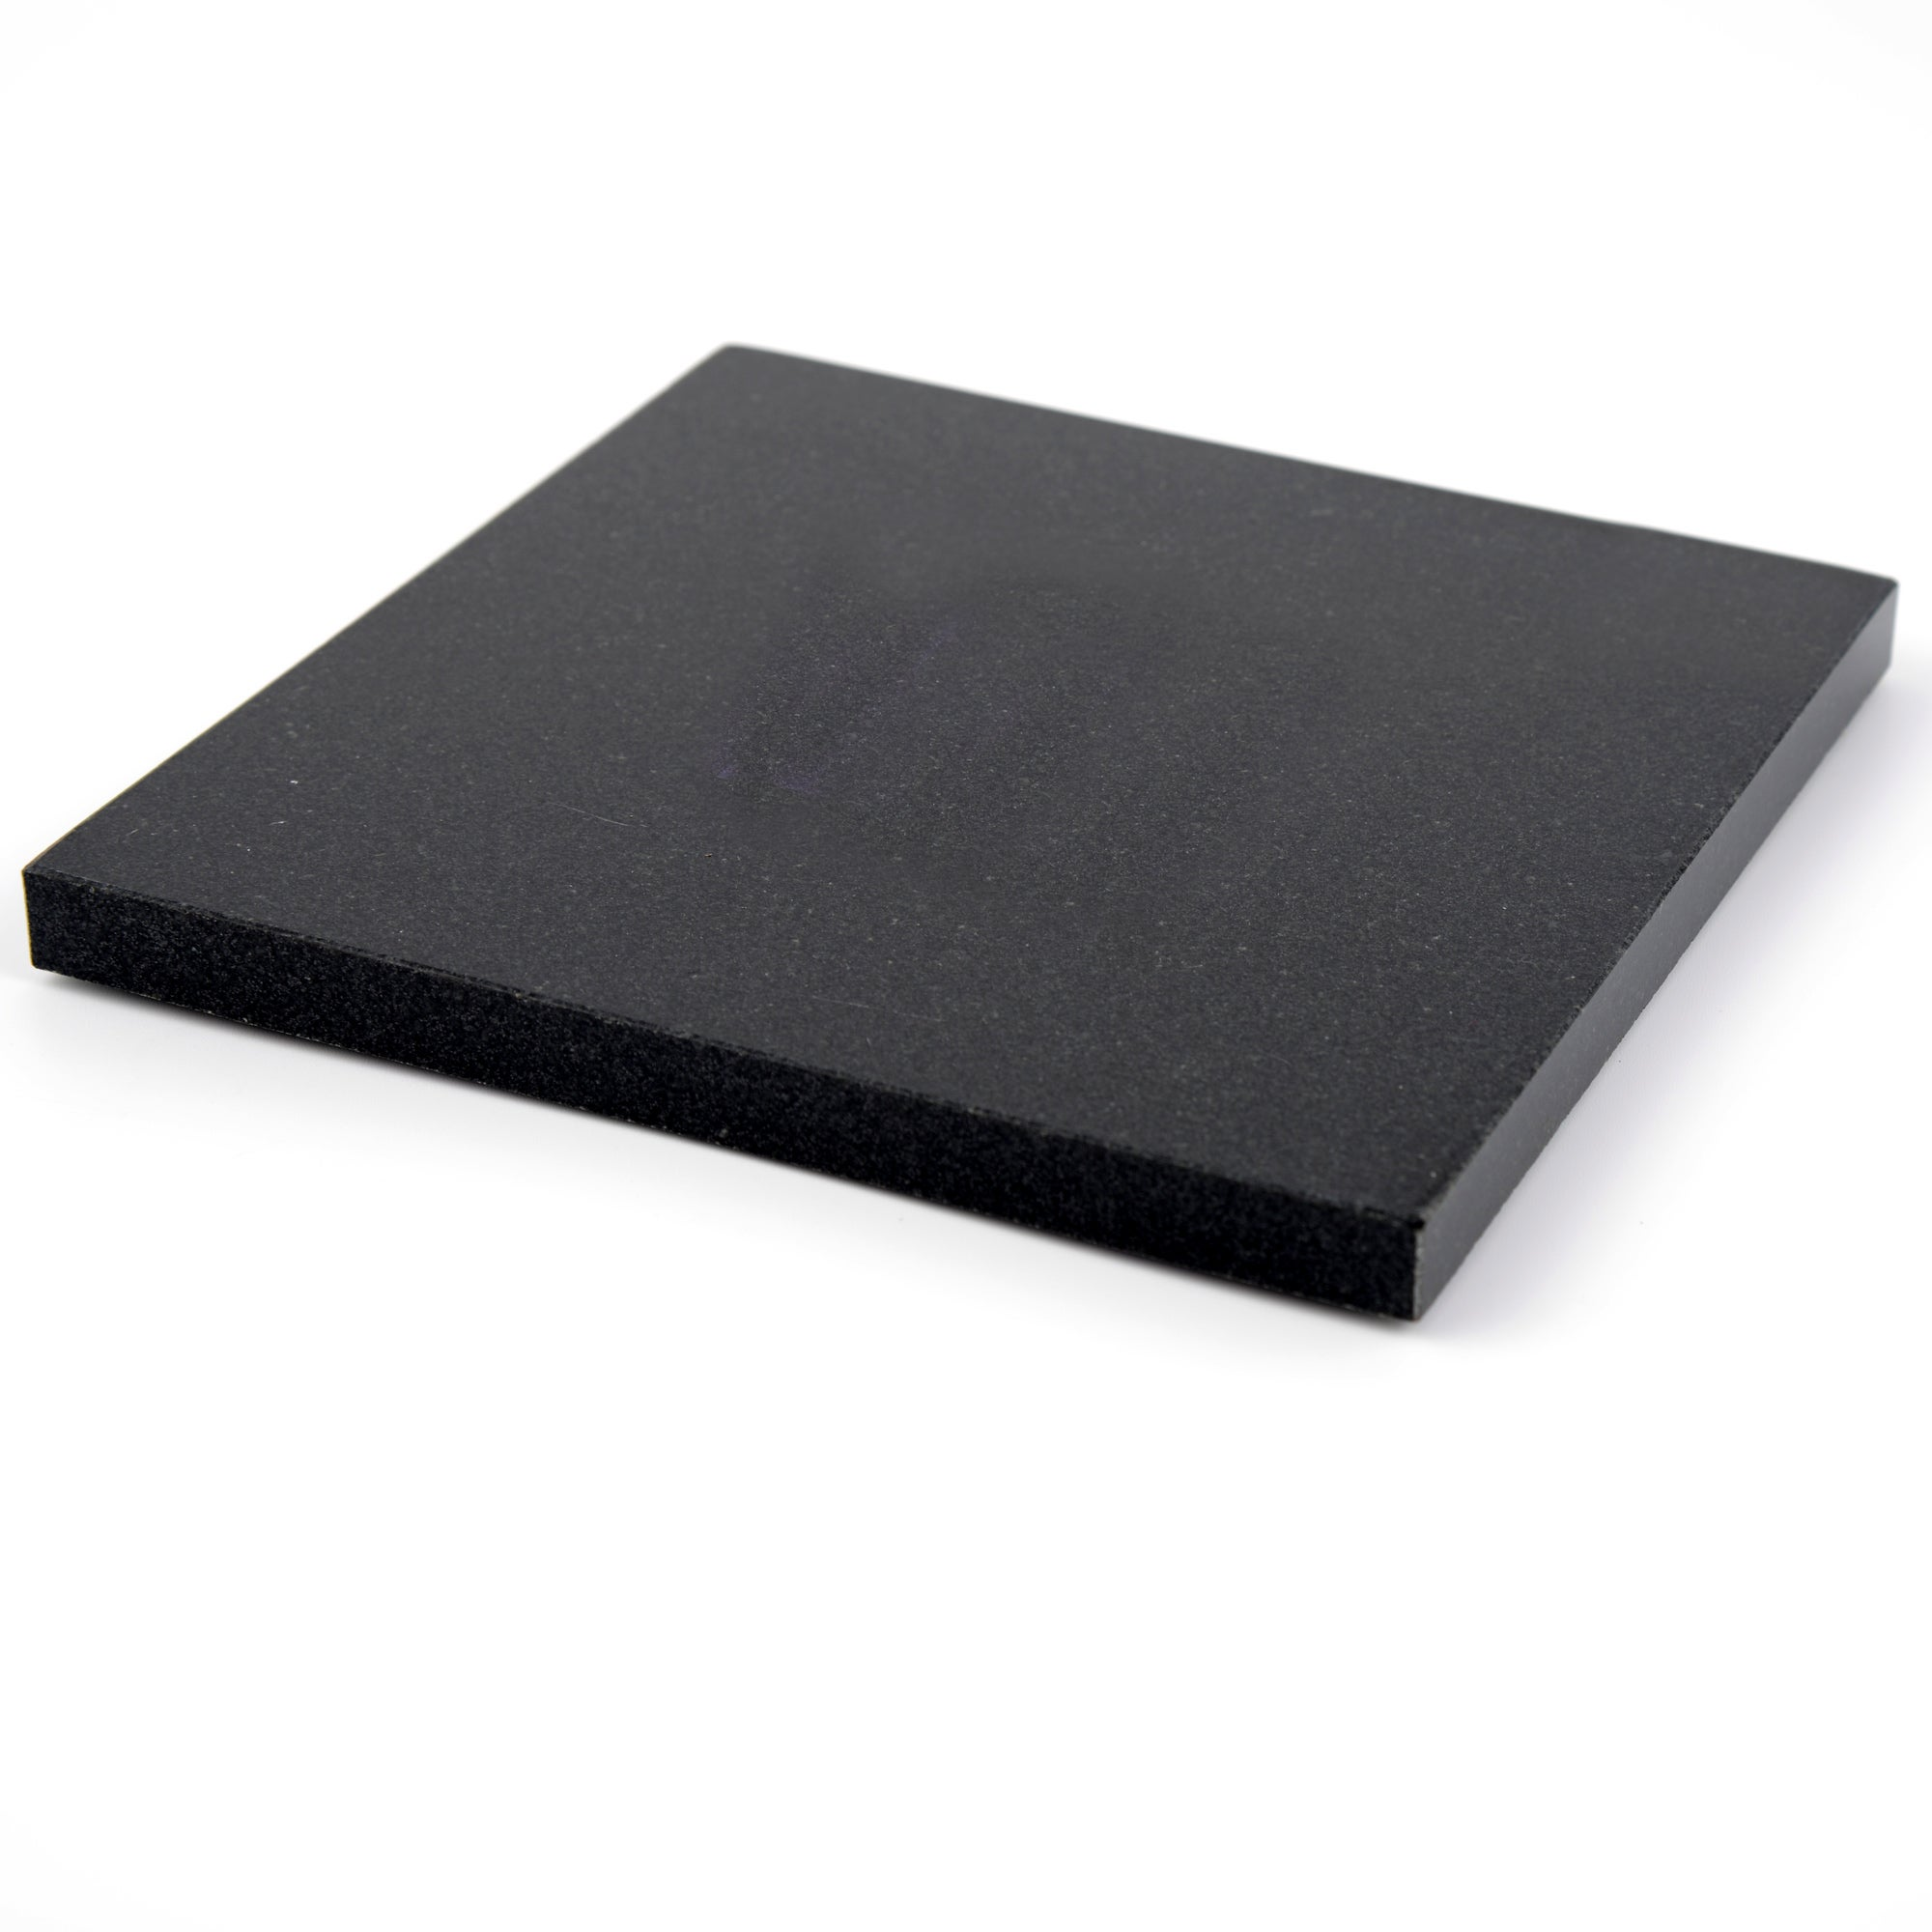 Black Granite Trivet